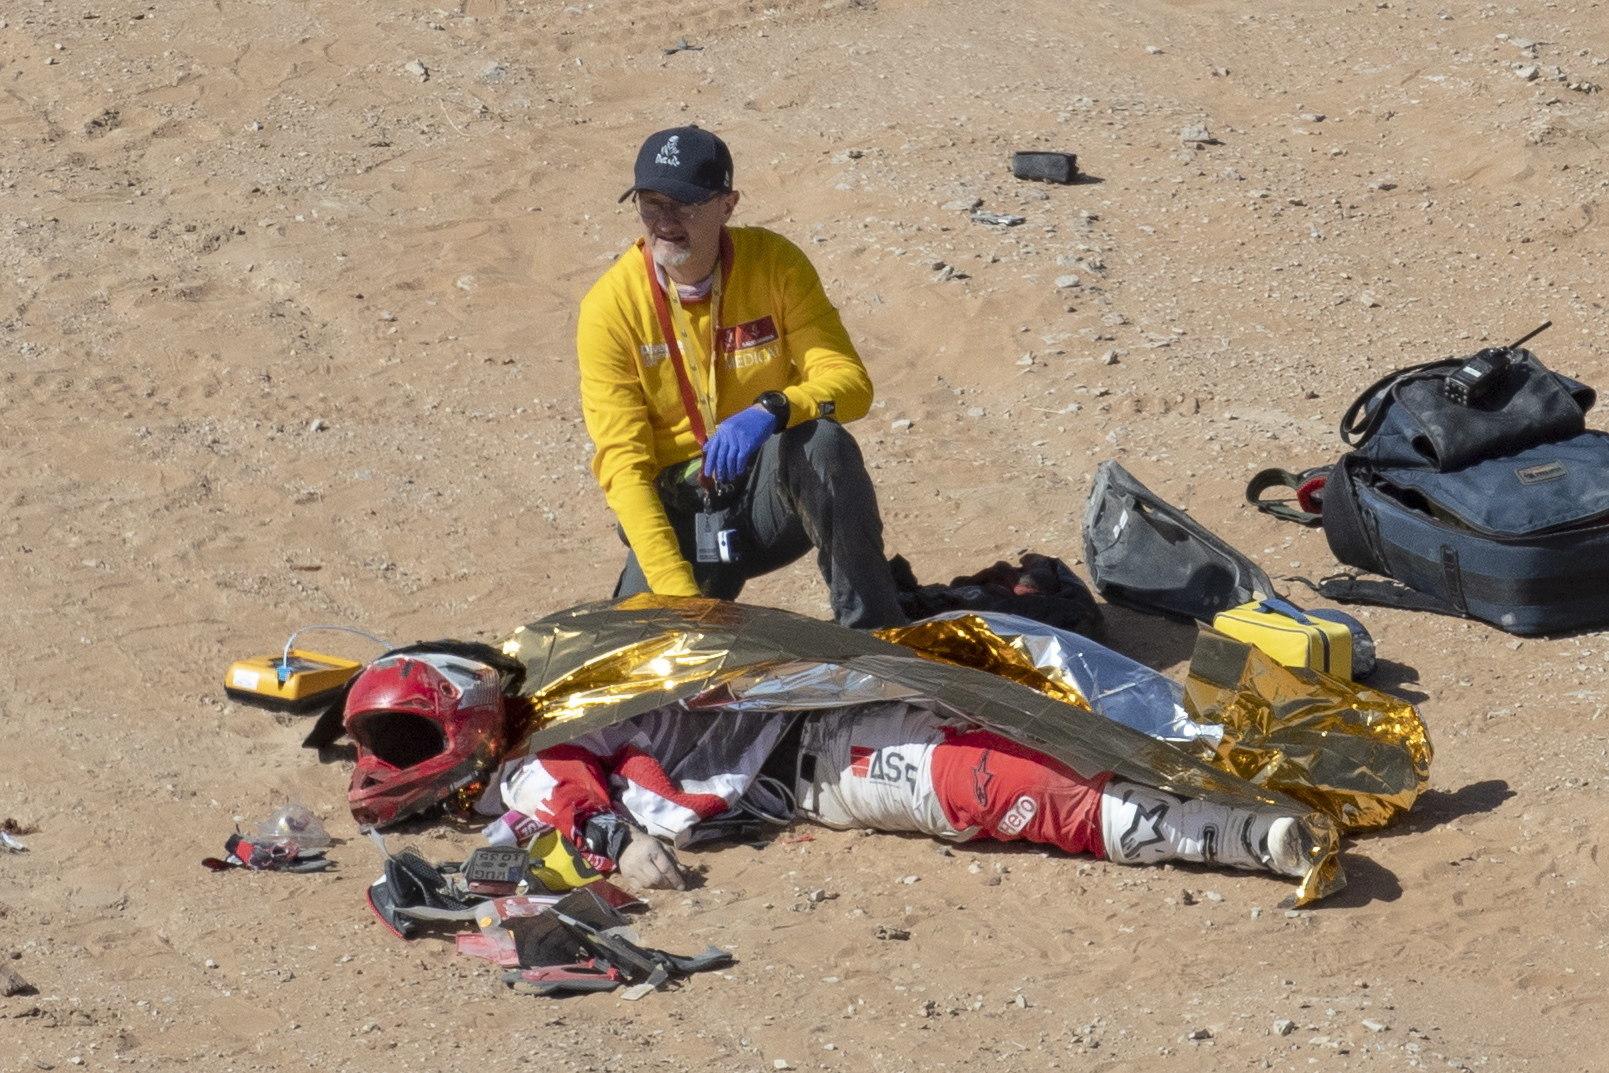 Wadi Al Dawasir (Saudi Arabia), 18/12/2019.- A medic kneels next to Portuguese rider Paulo <HIT>Goncalves</HIT> after a crash during stage seven of the Rally Dakar 2020 between Riyadh and Wadi Al-Dawasir in Saudi Arabia, 12 January 2020. The Portuguese veteran motorcyclist has died in the crash. (Arabia Saudita) EPA/